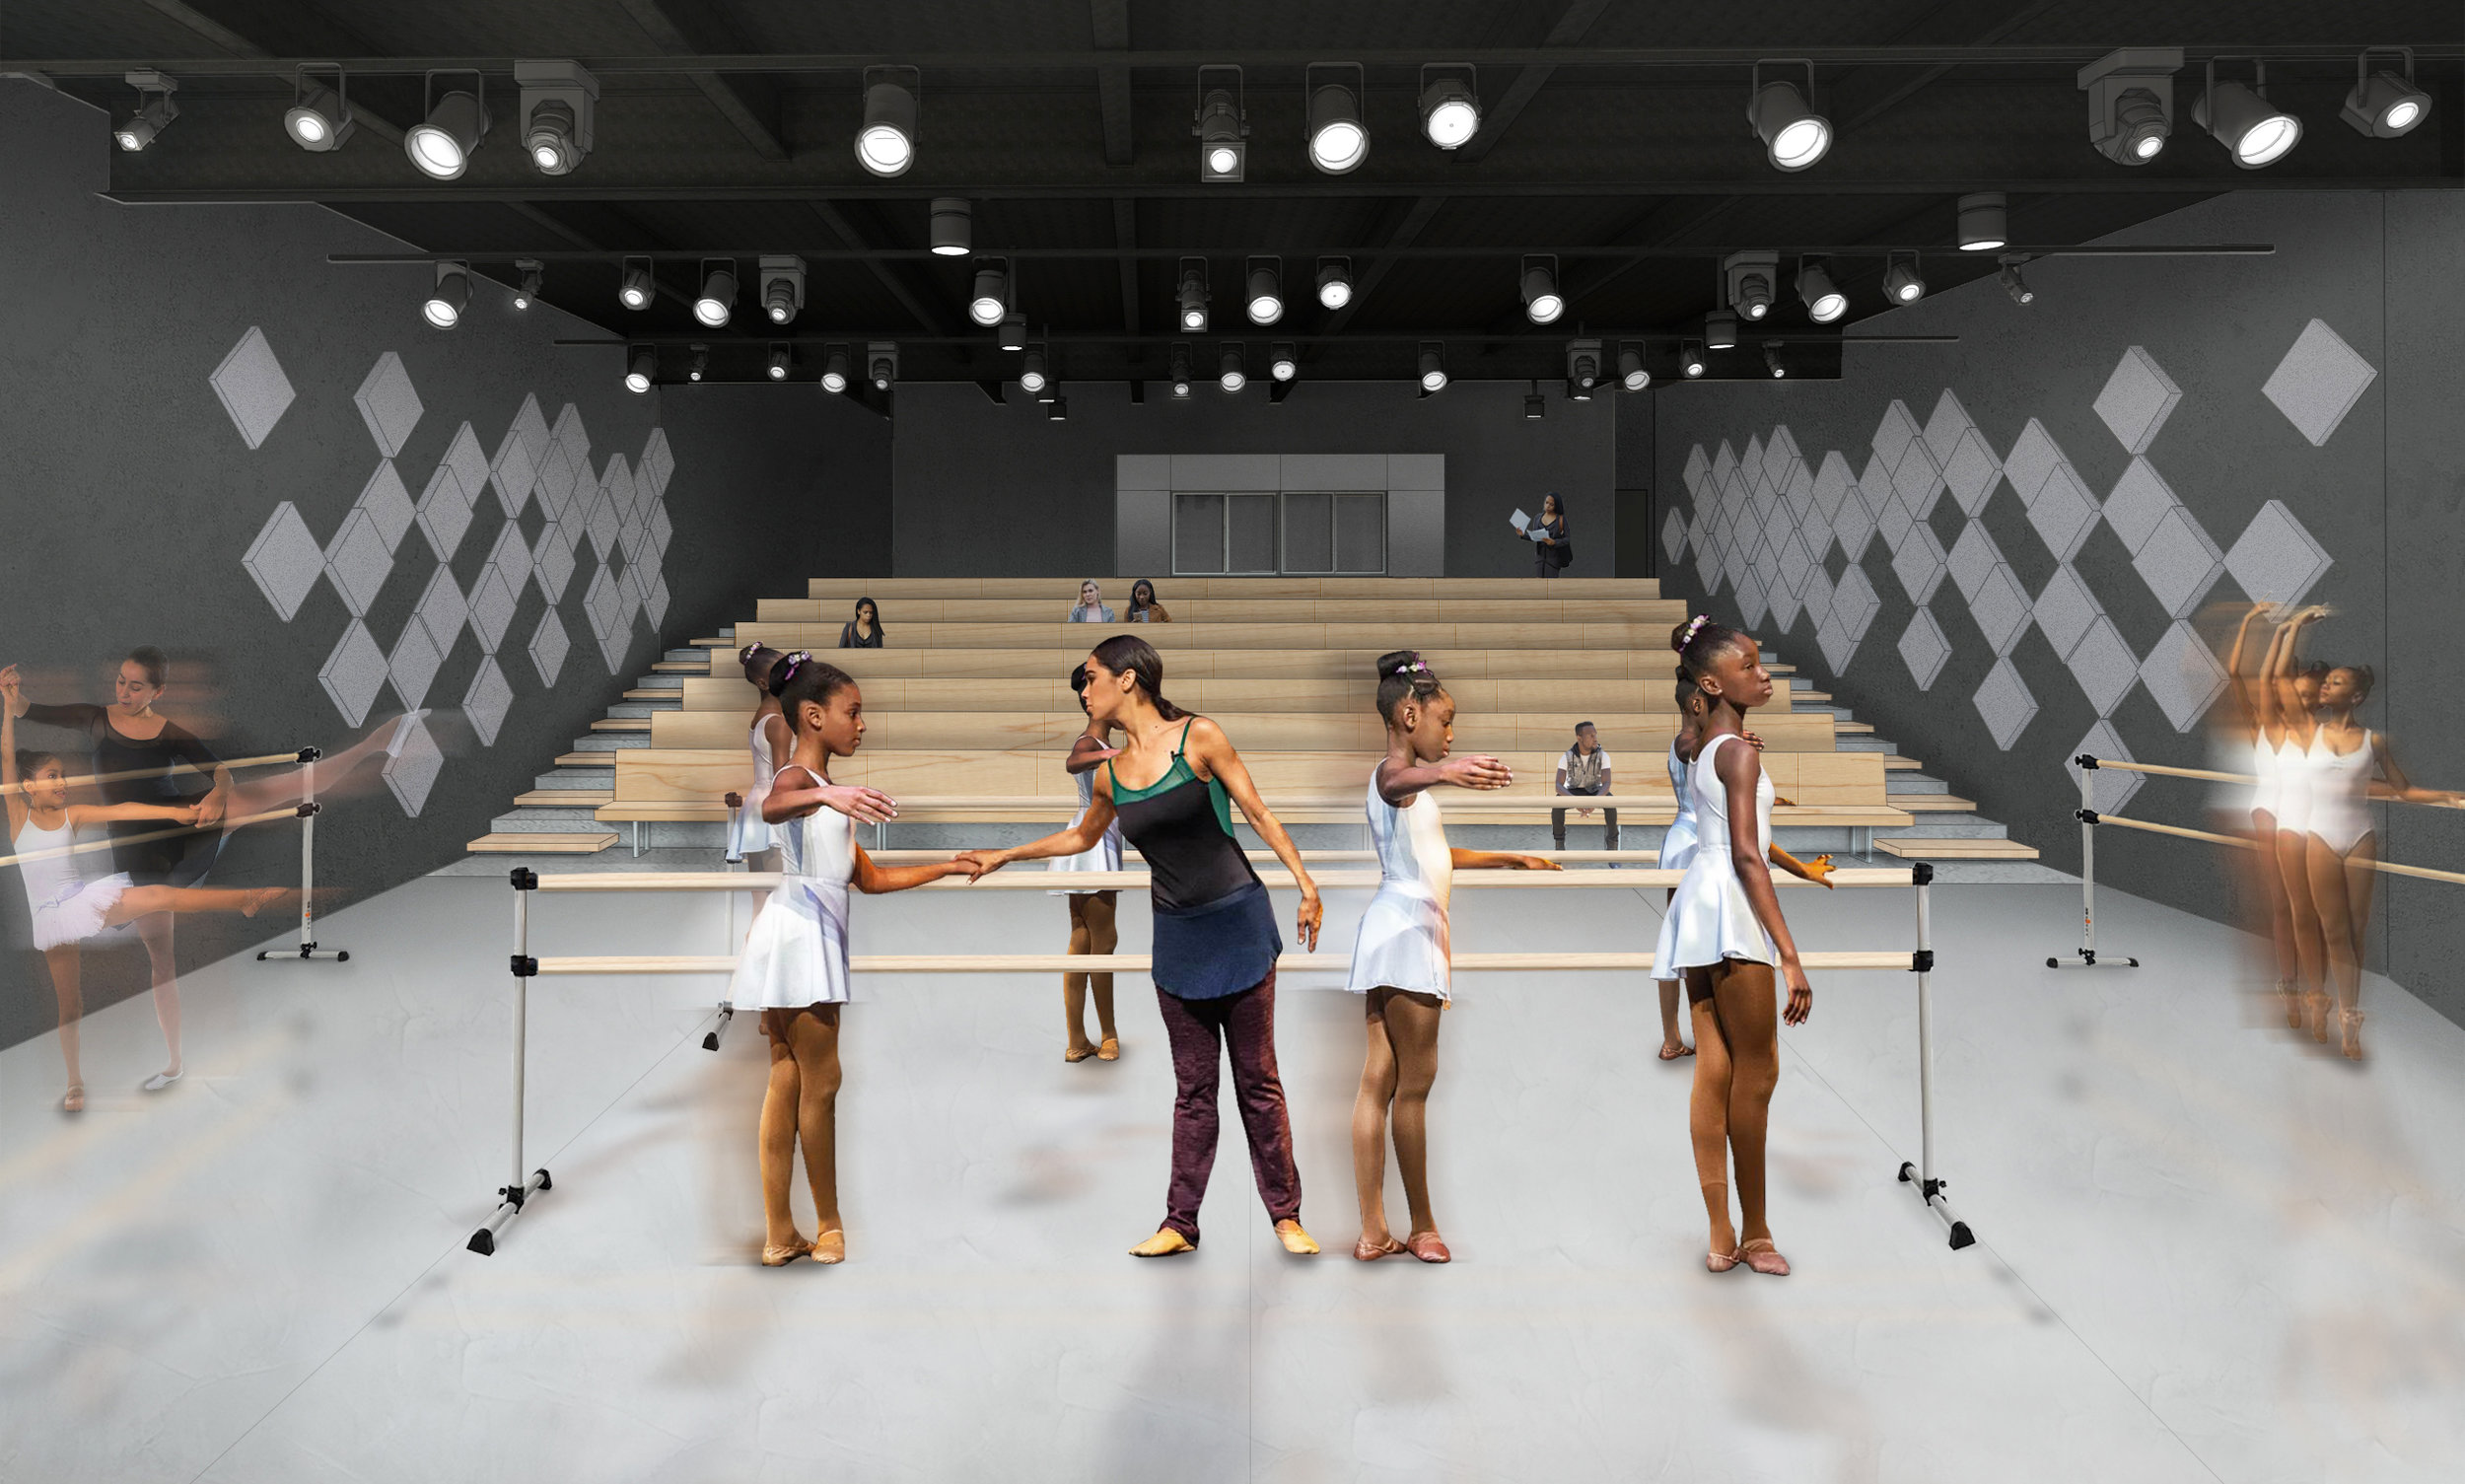 2018-04-25_Dance Lab Render.jpg